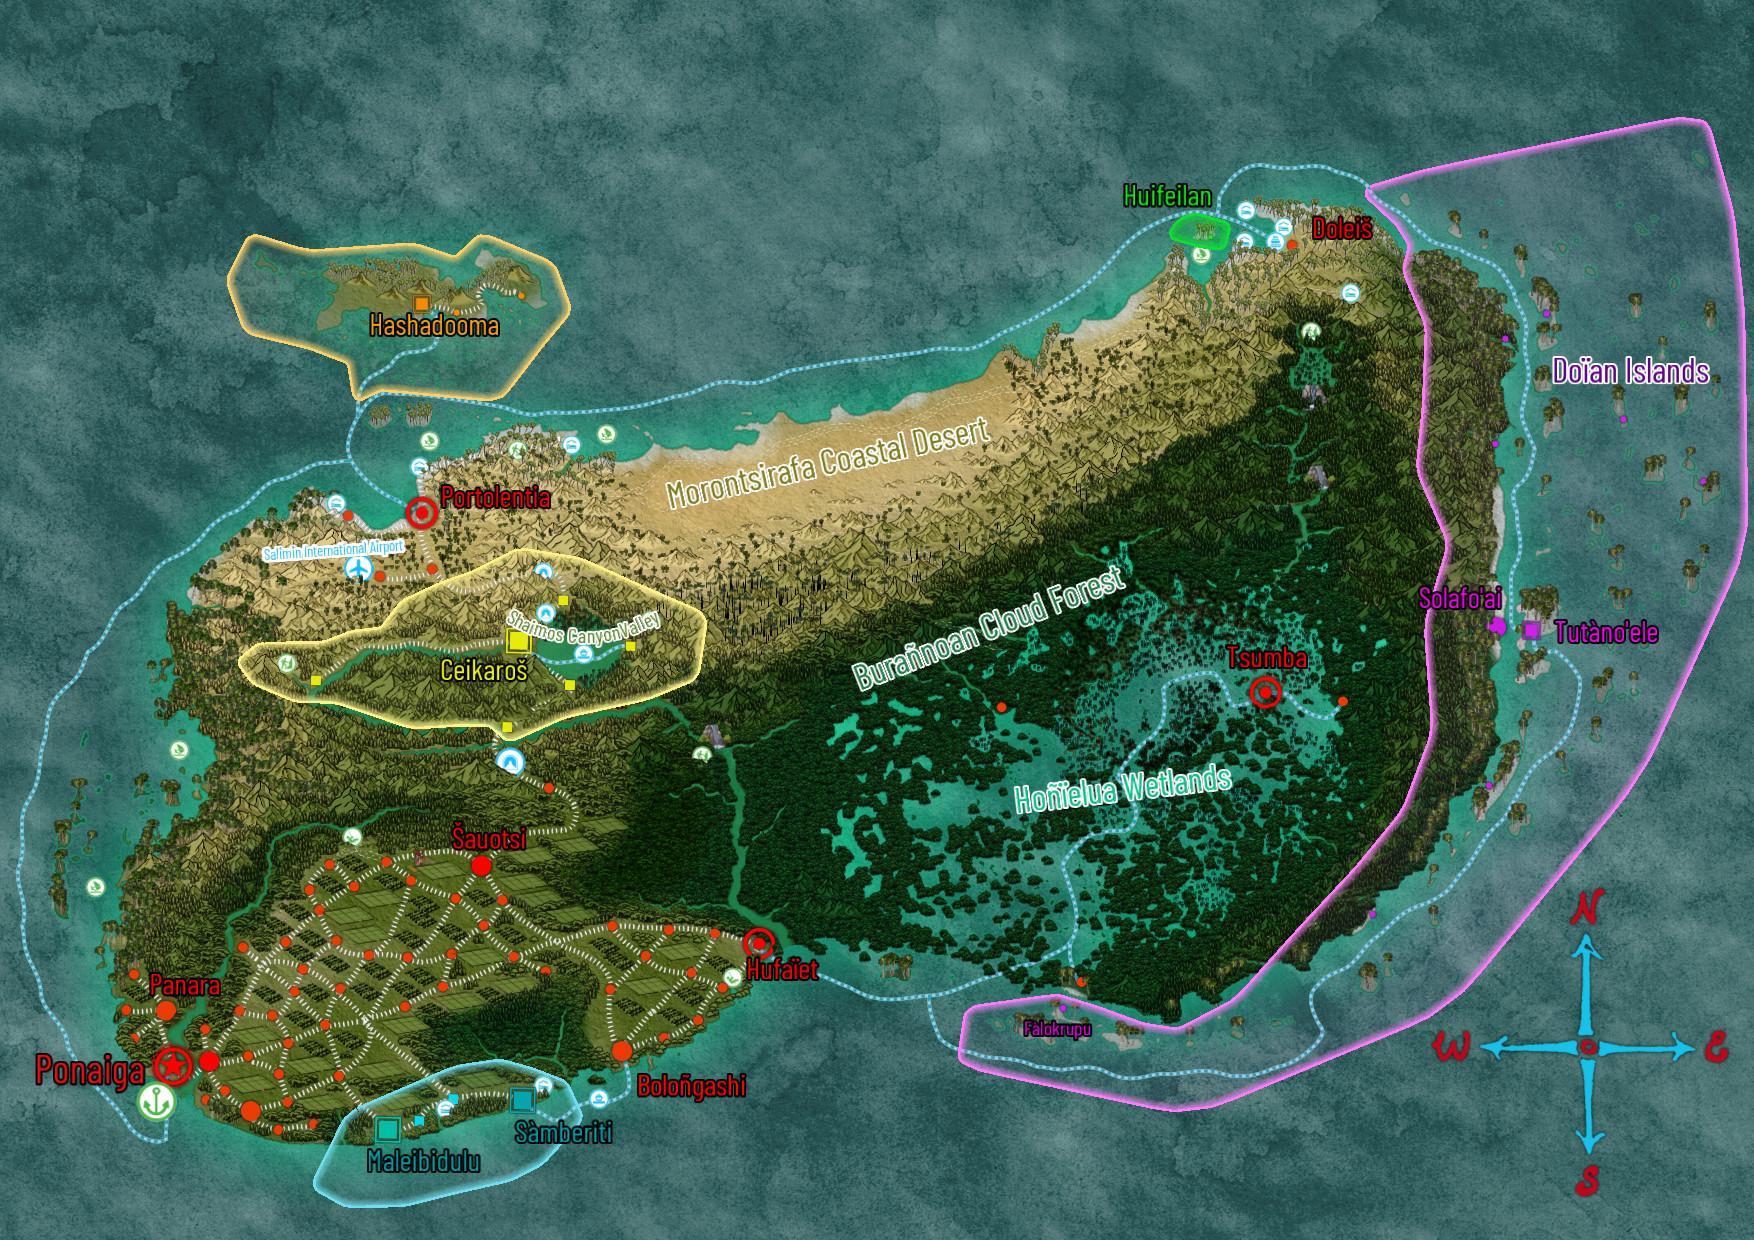 Map of Bunkaiia and its autonomous regions, including the Doyan Islands